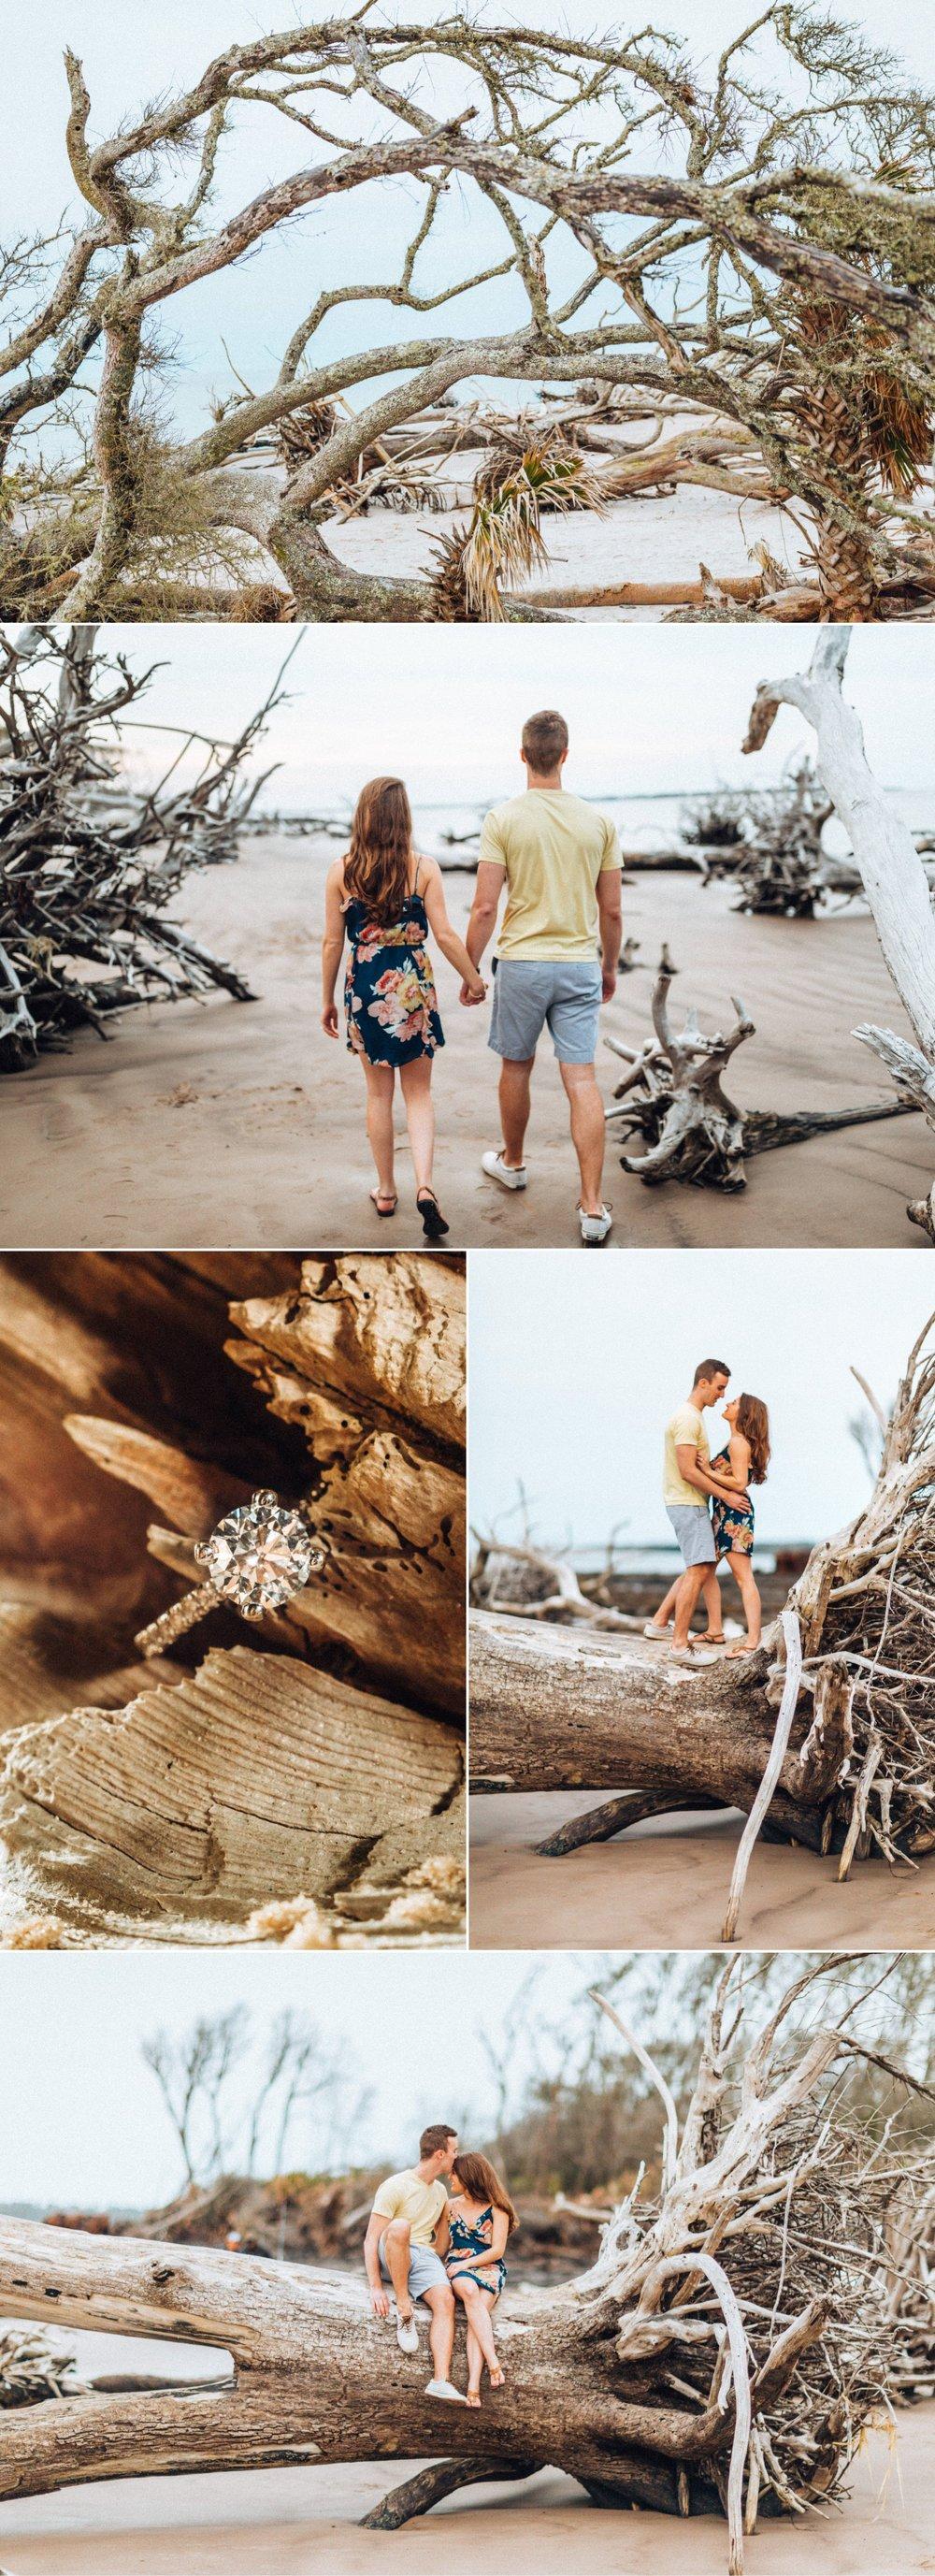 Big Talbot Island engagement photos by Shaina DeCiryan